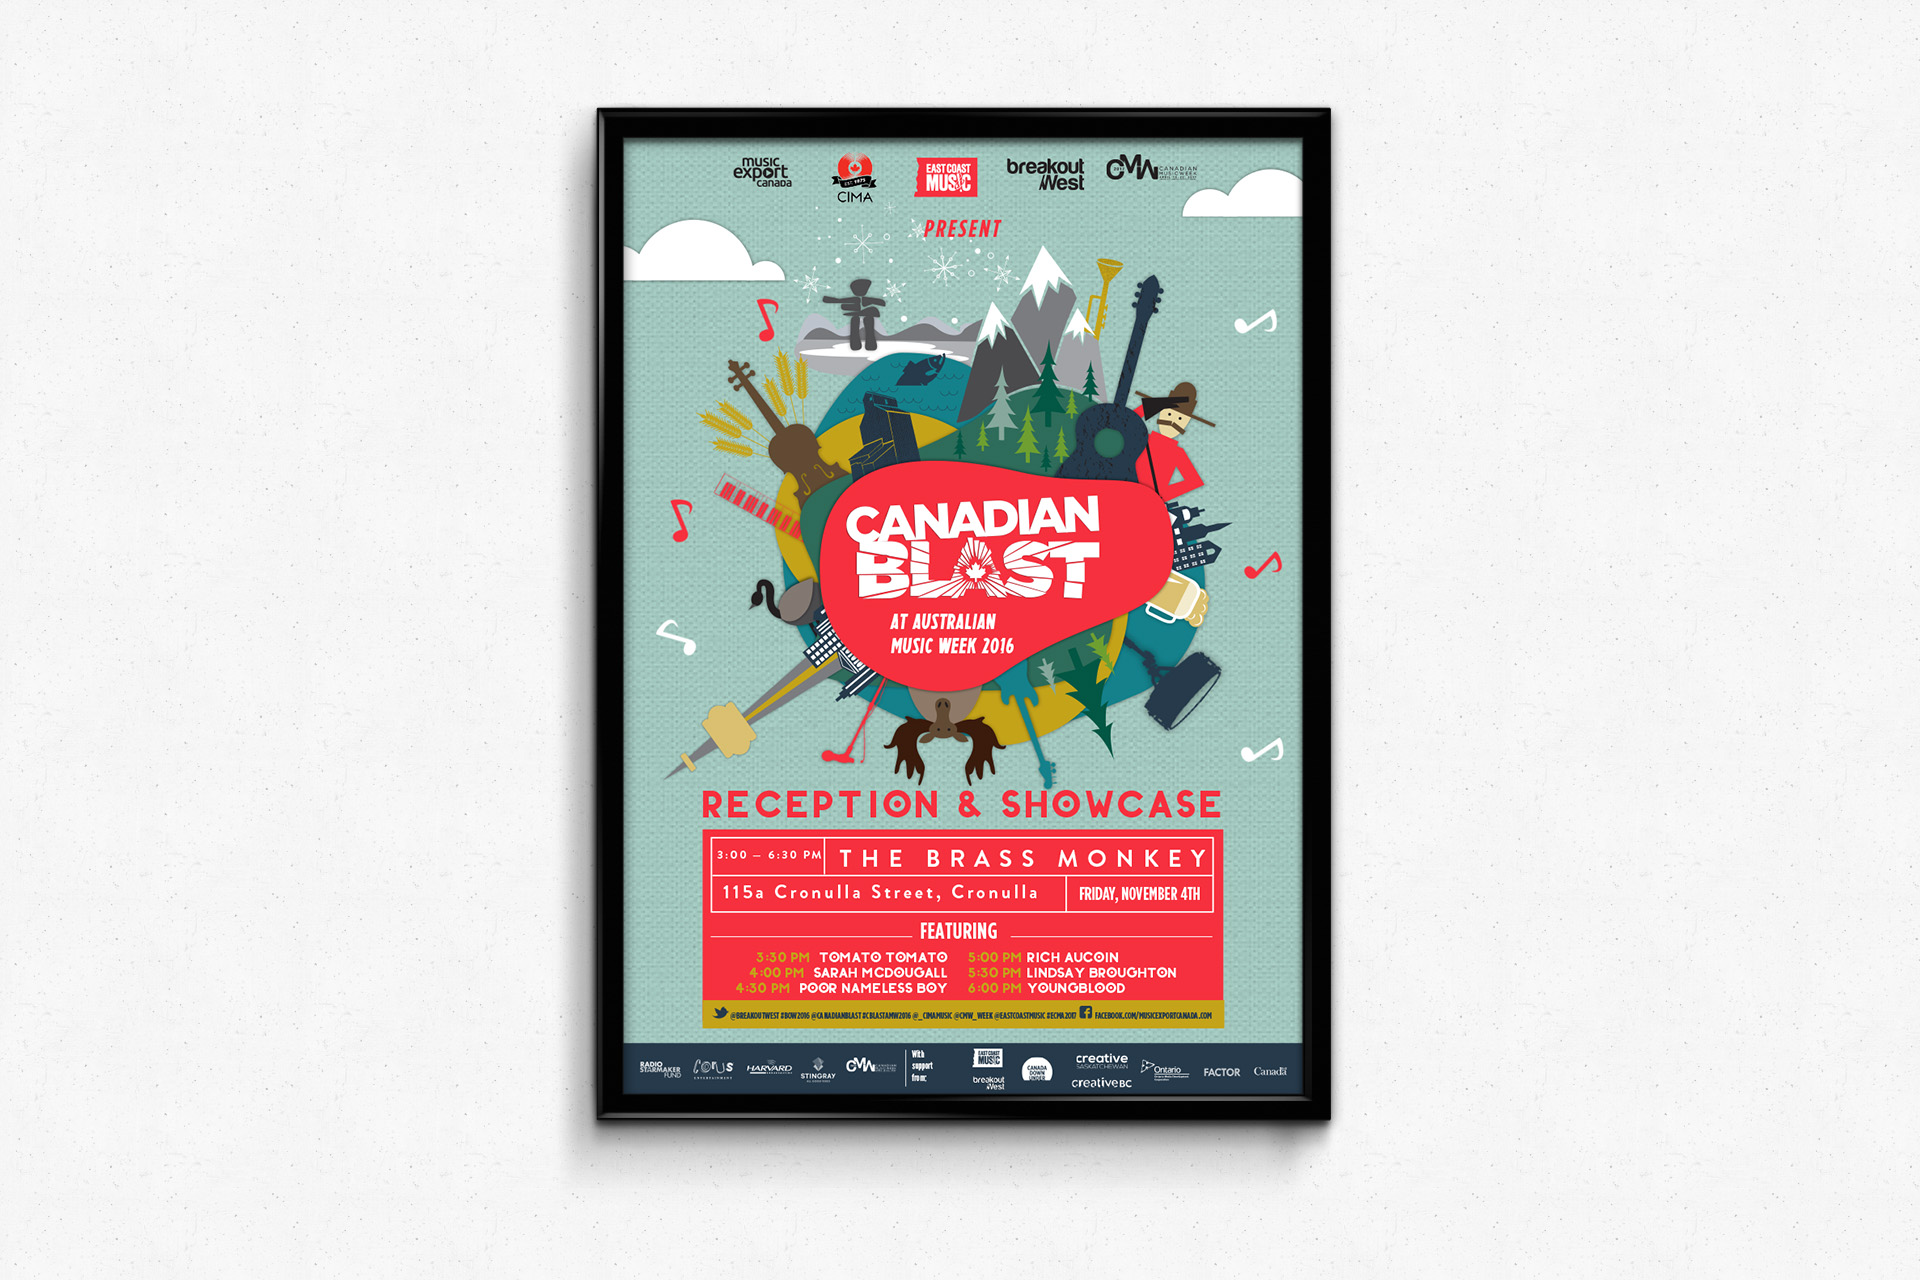 Canadian Blast at Australian Music Week